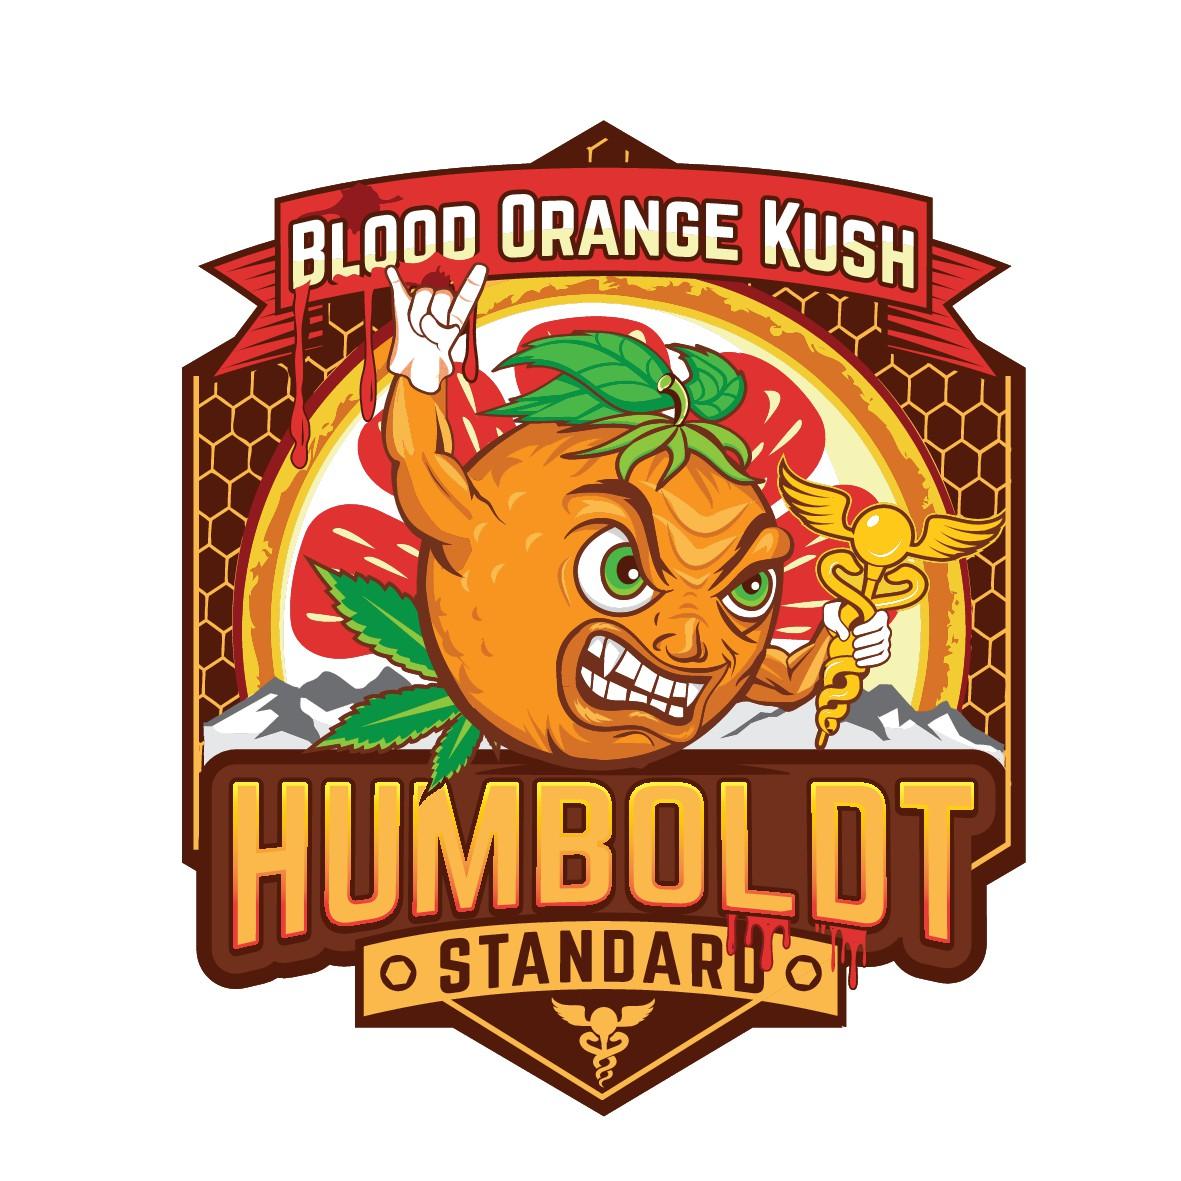 Humboldt Standards Blood Orange Kush